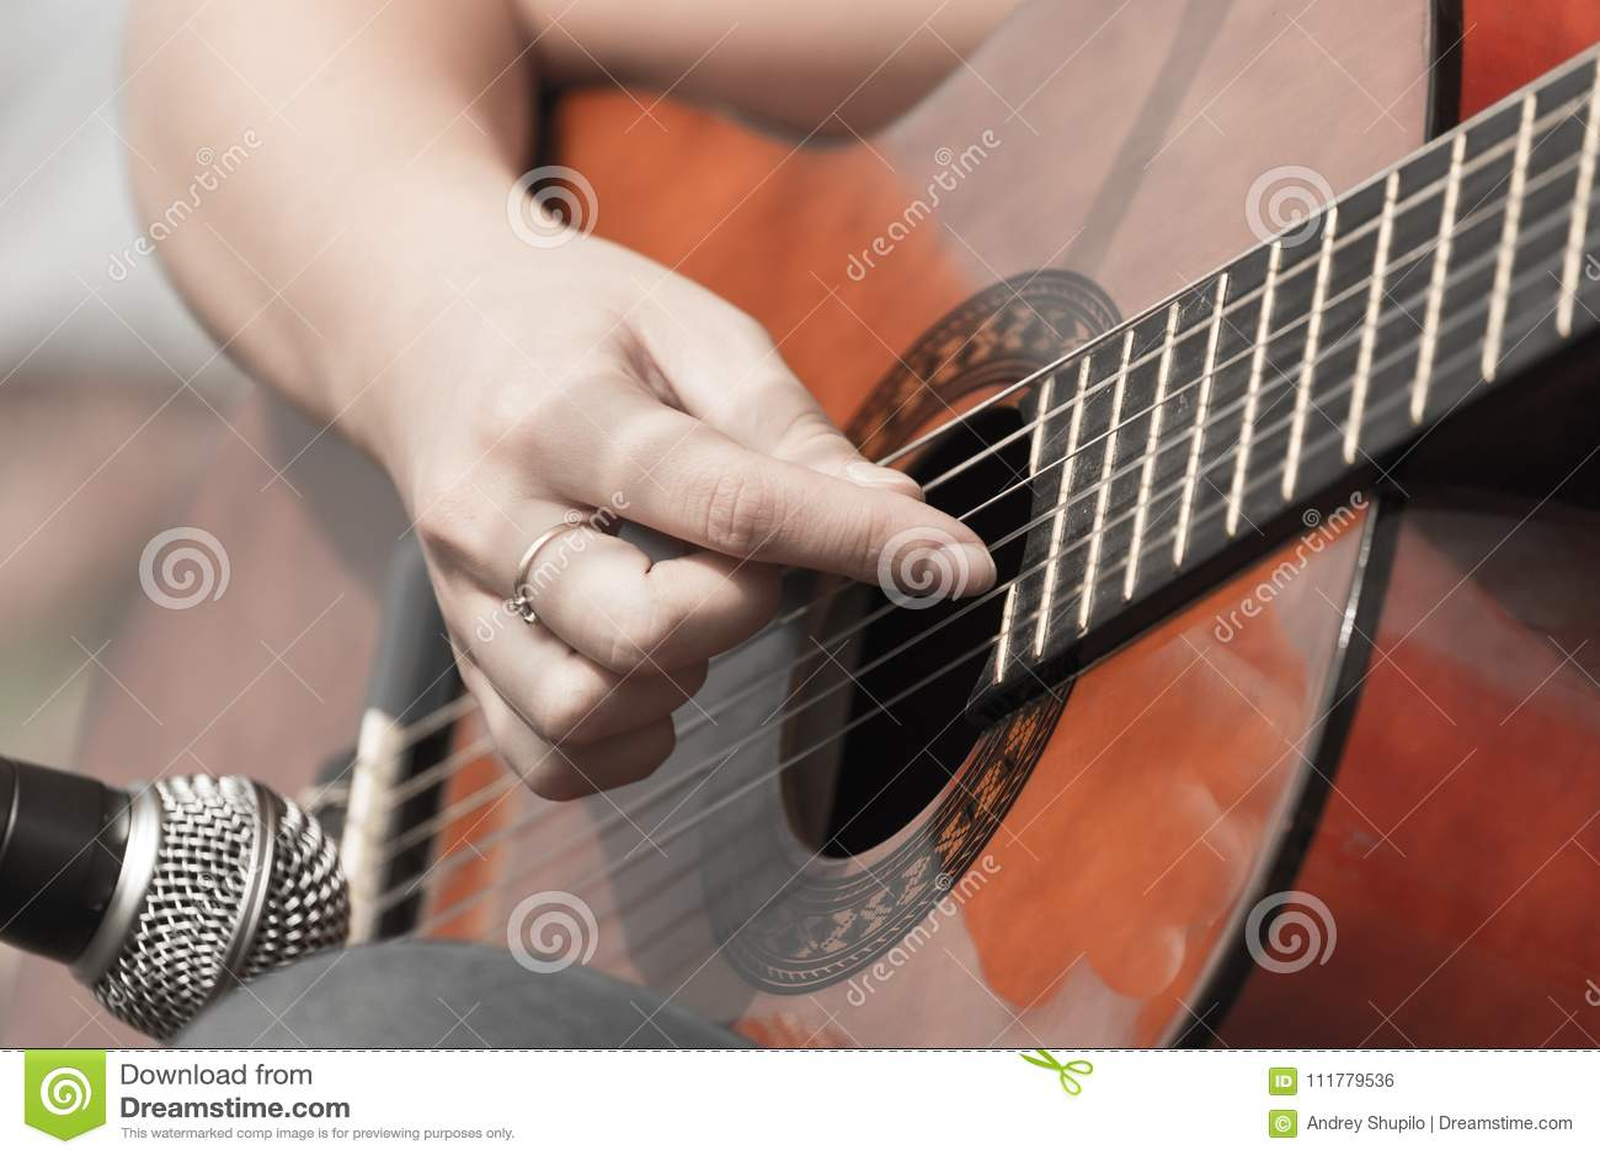 Girl`s hand playing guitar